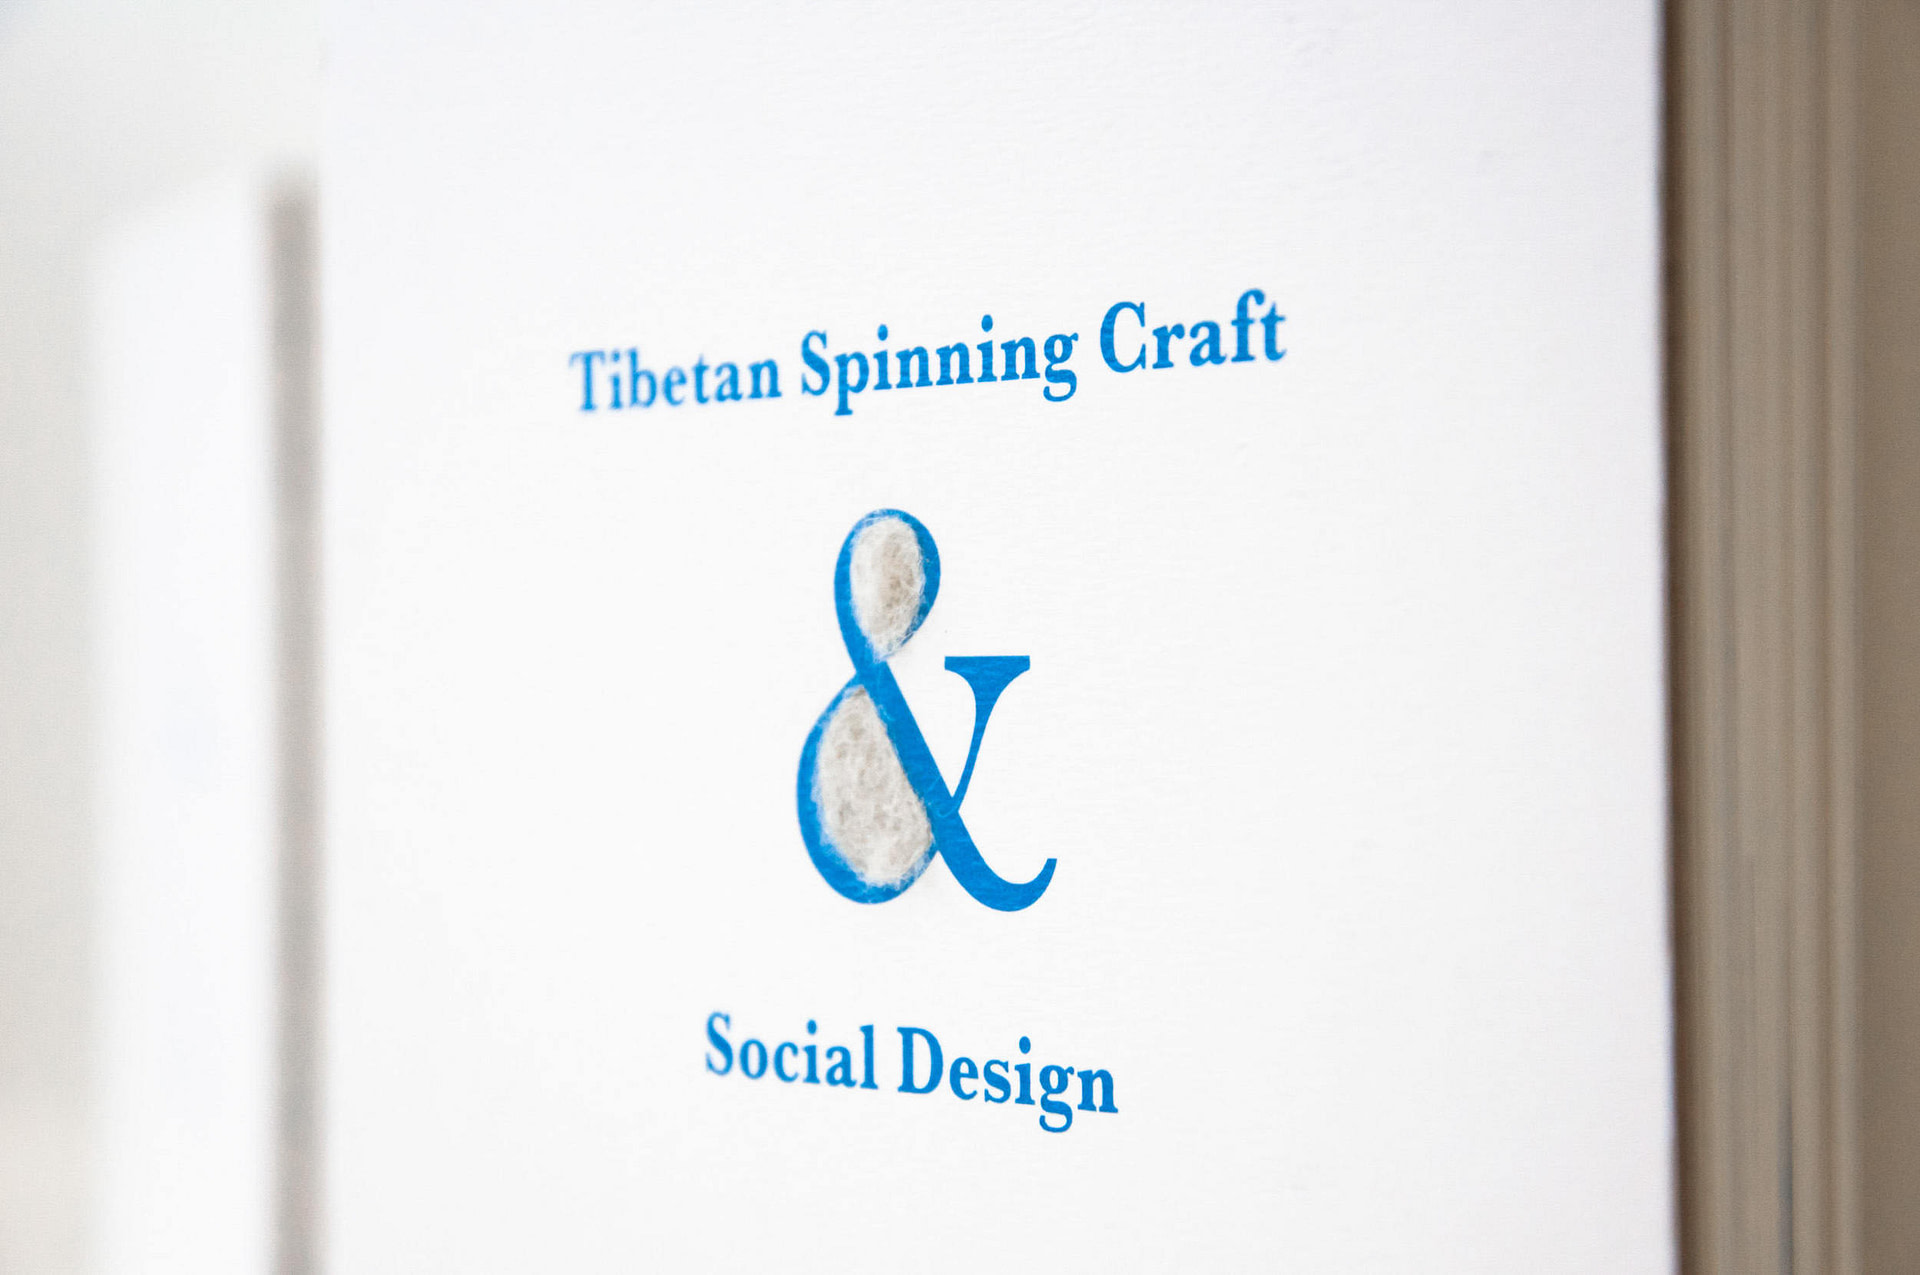 Tibetan Spinning Craft and Social Design 13